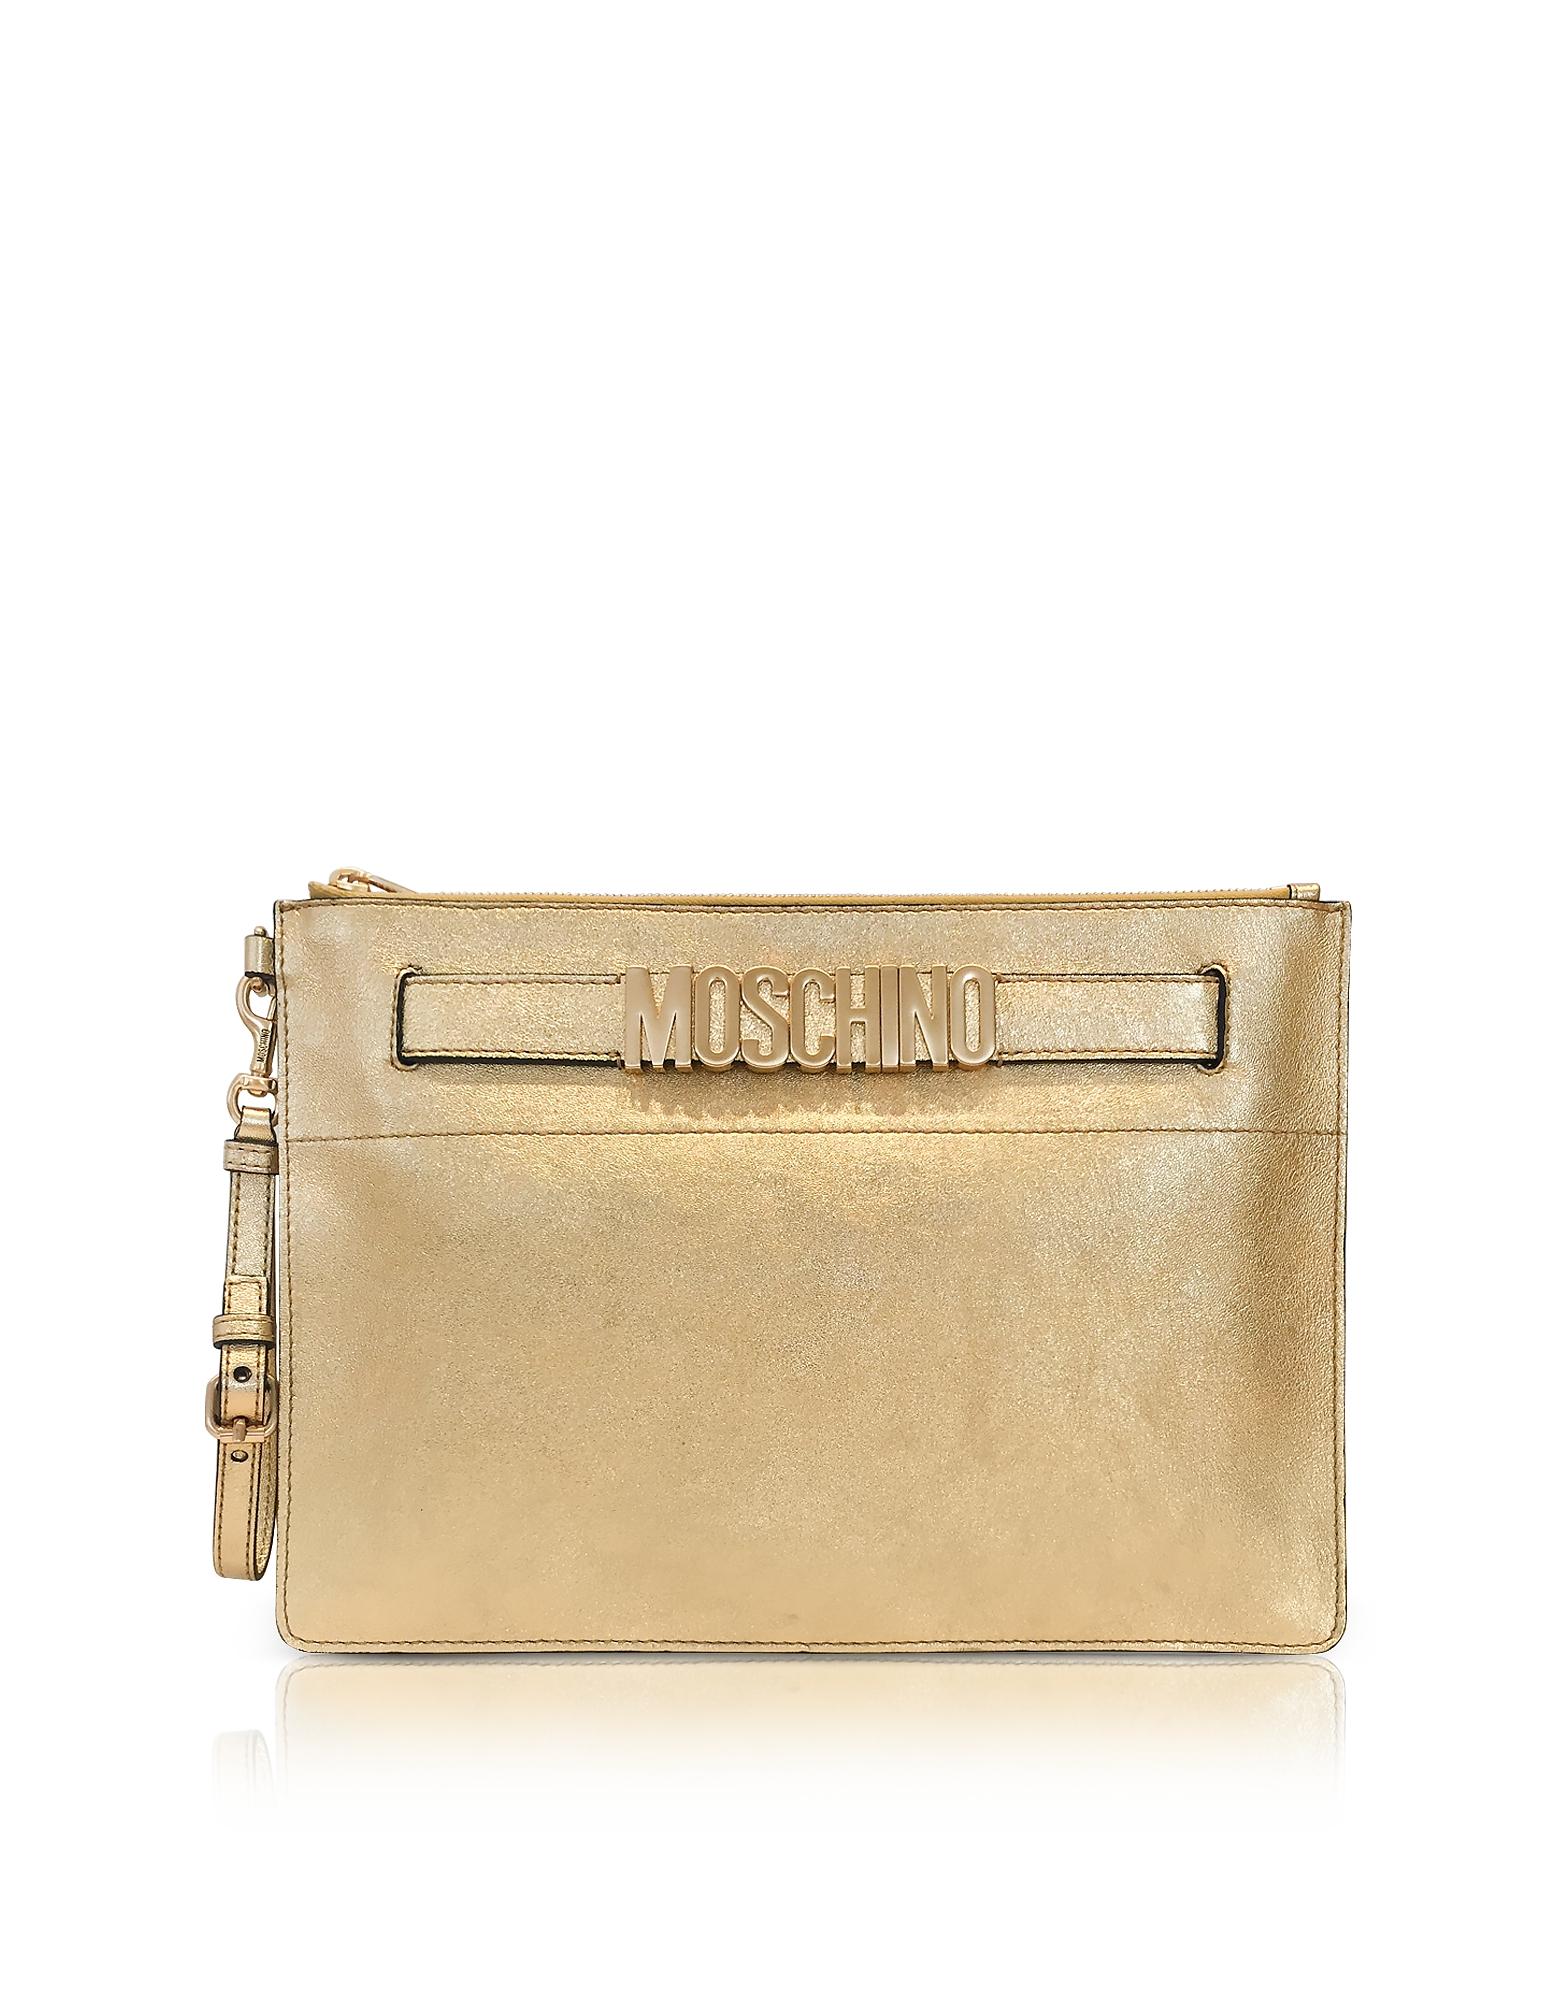 Moschino Handbags, Gold Metallic Leather Clutch w/Signature Logo